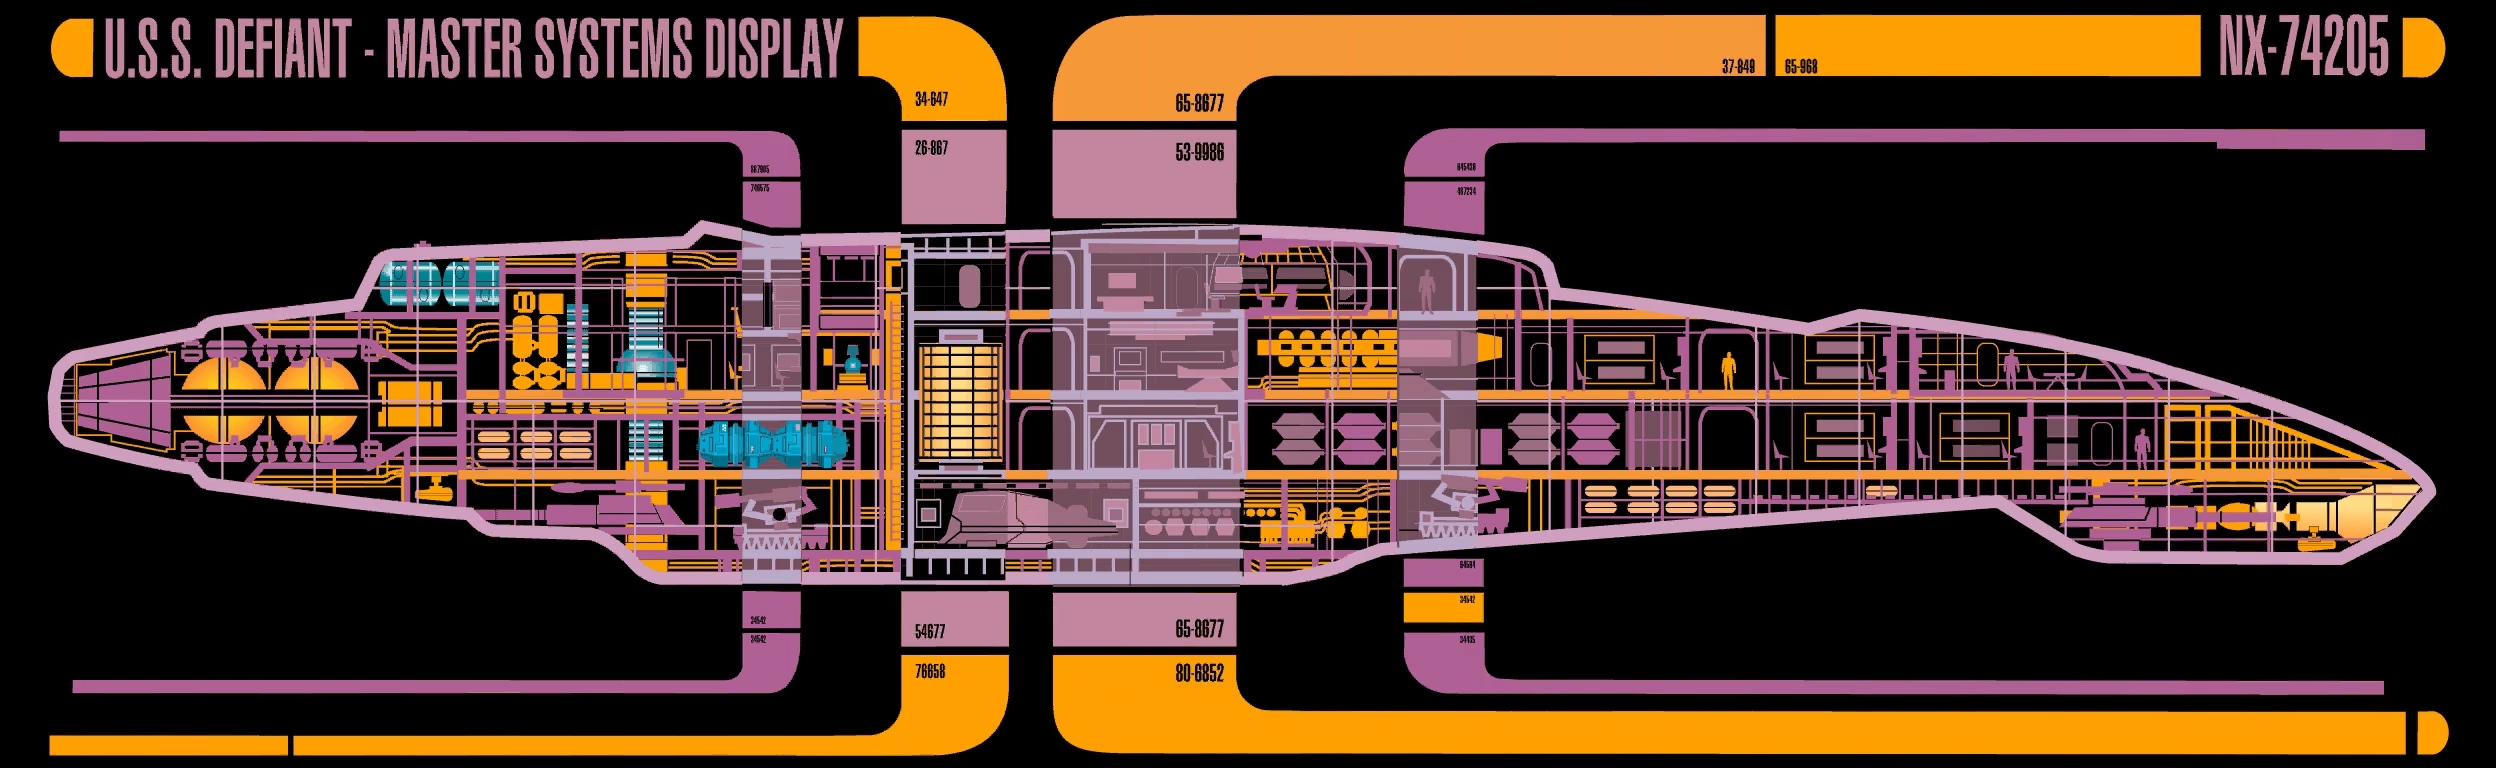 Defiant Class Memory Alpha Fandom Powered By Wikia Star Trek Engineering Schematics Defenses